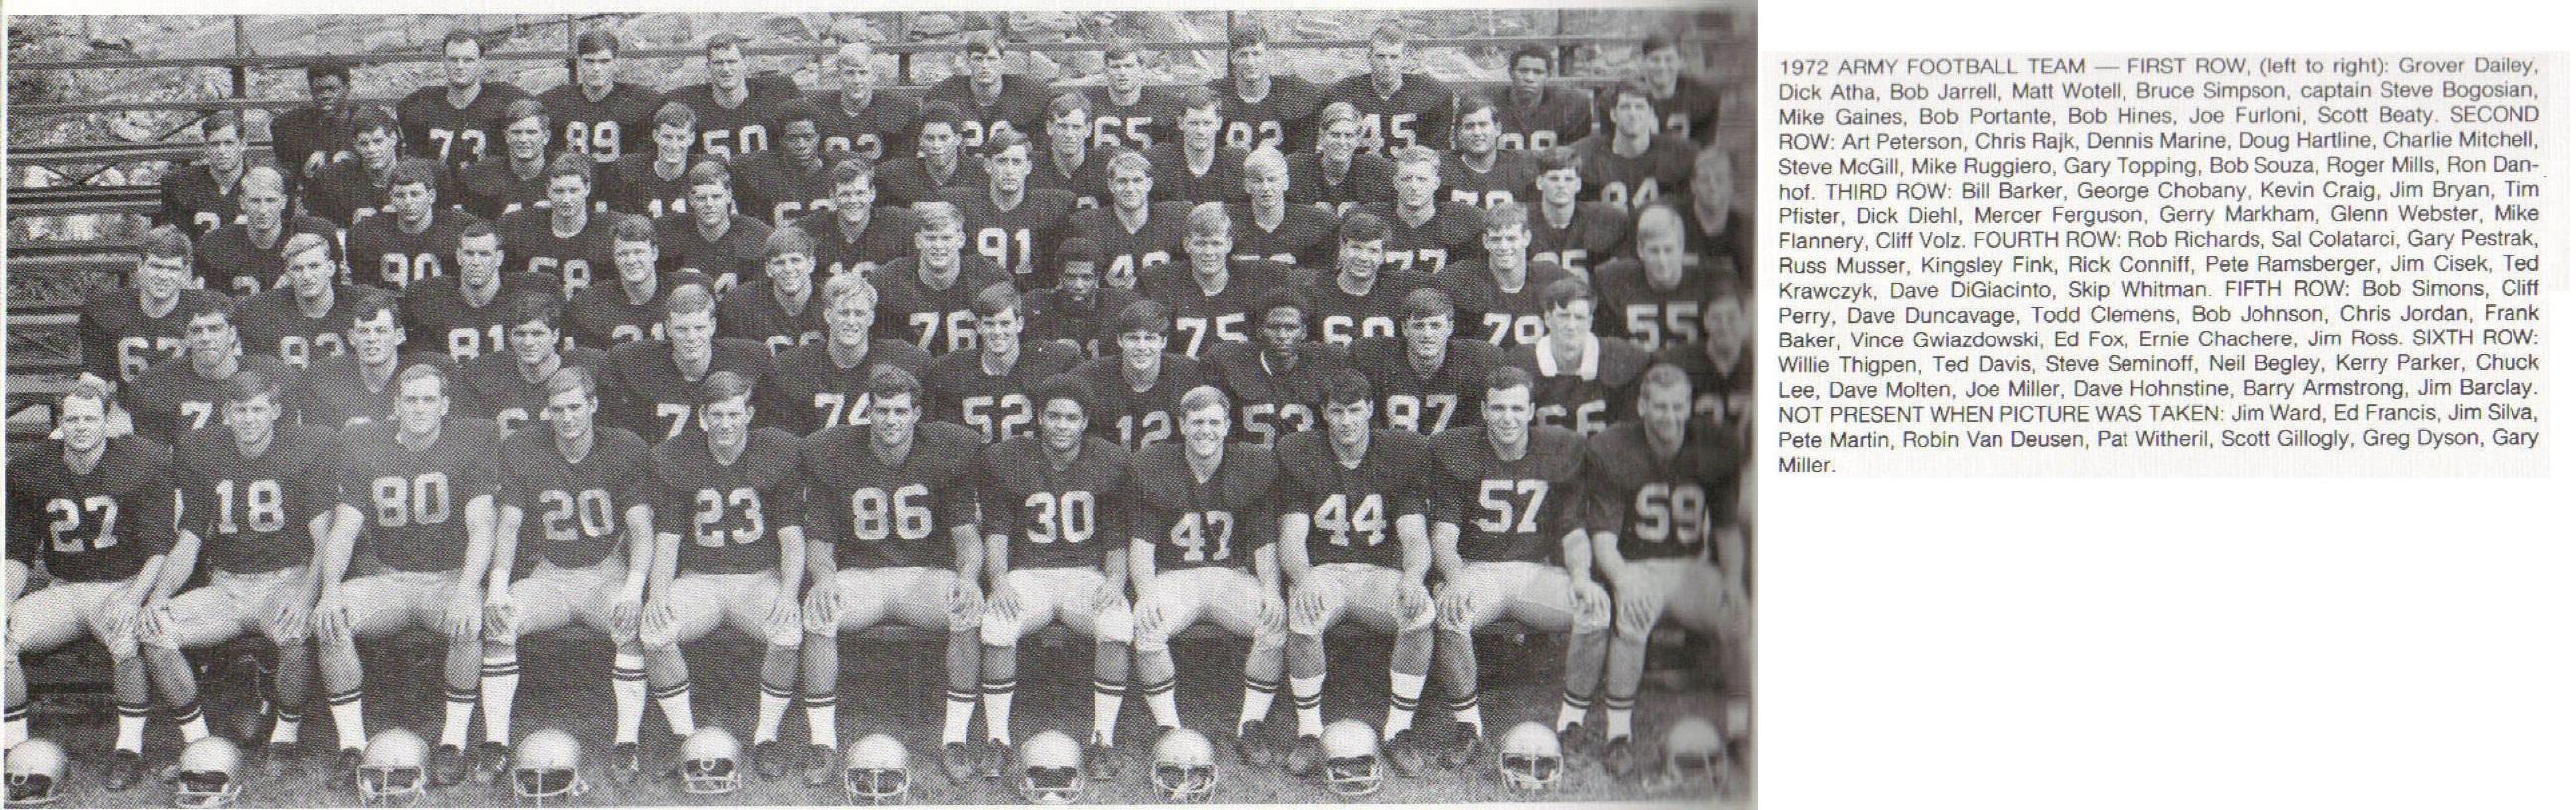 armyfb_1972_team